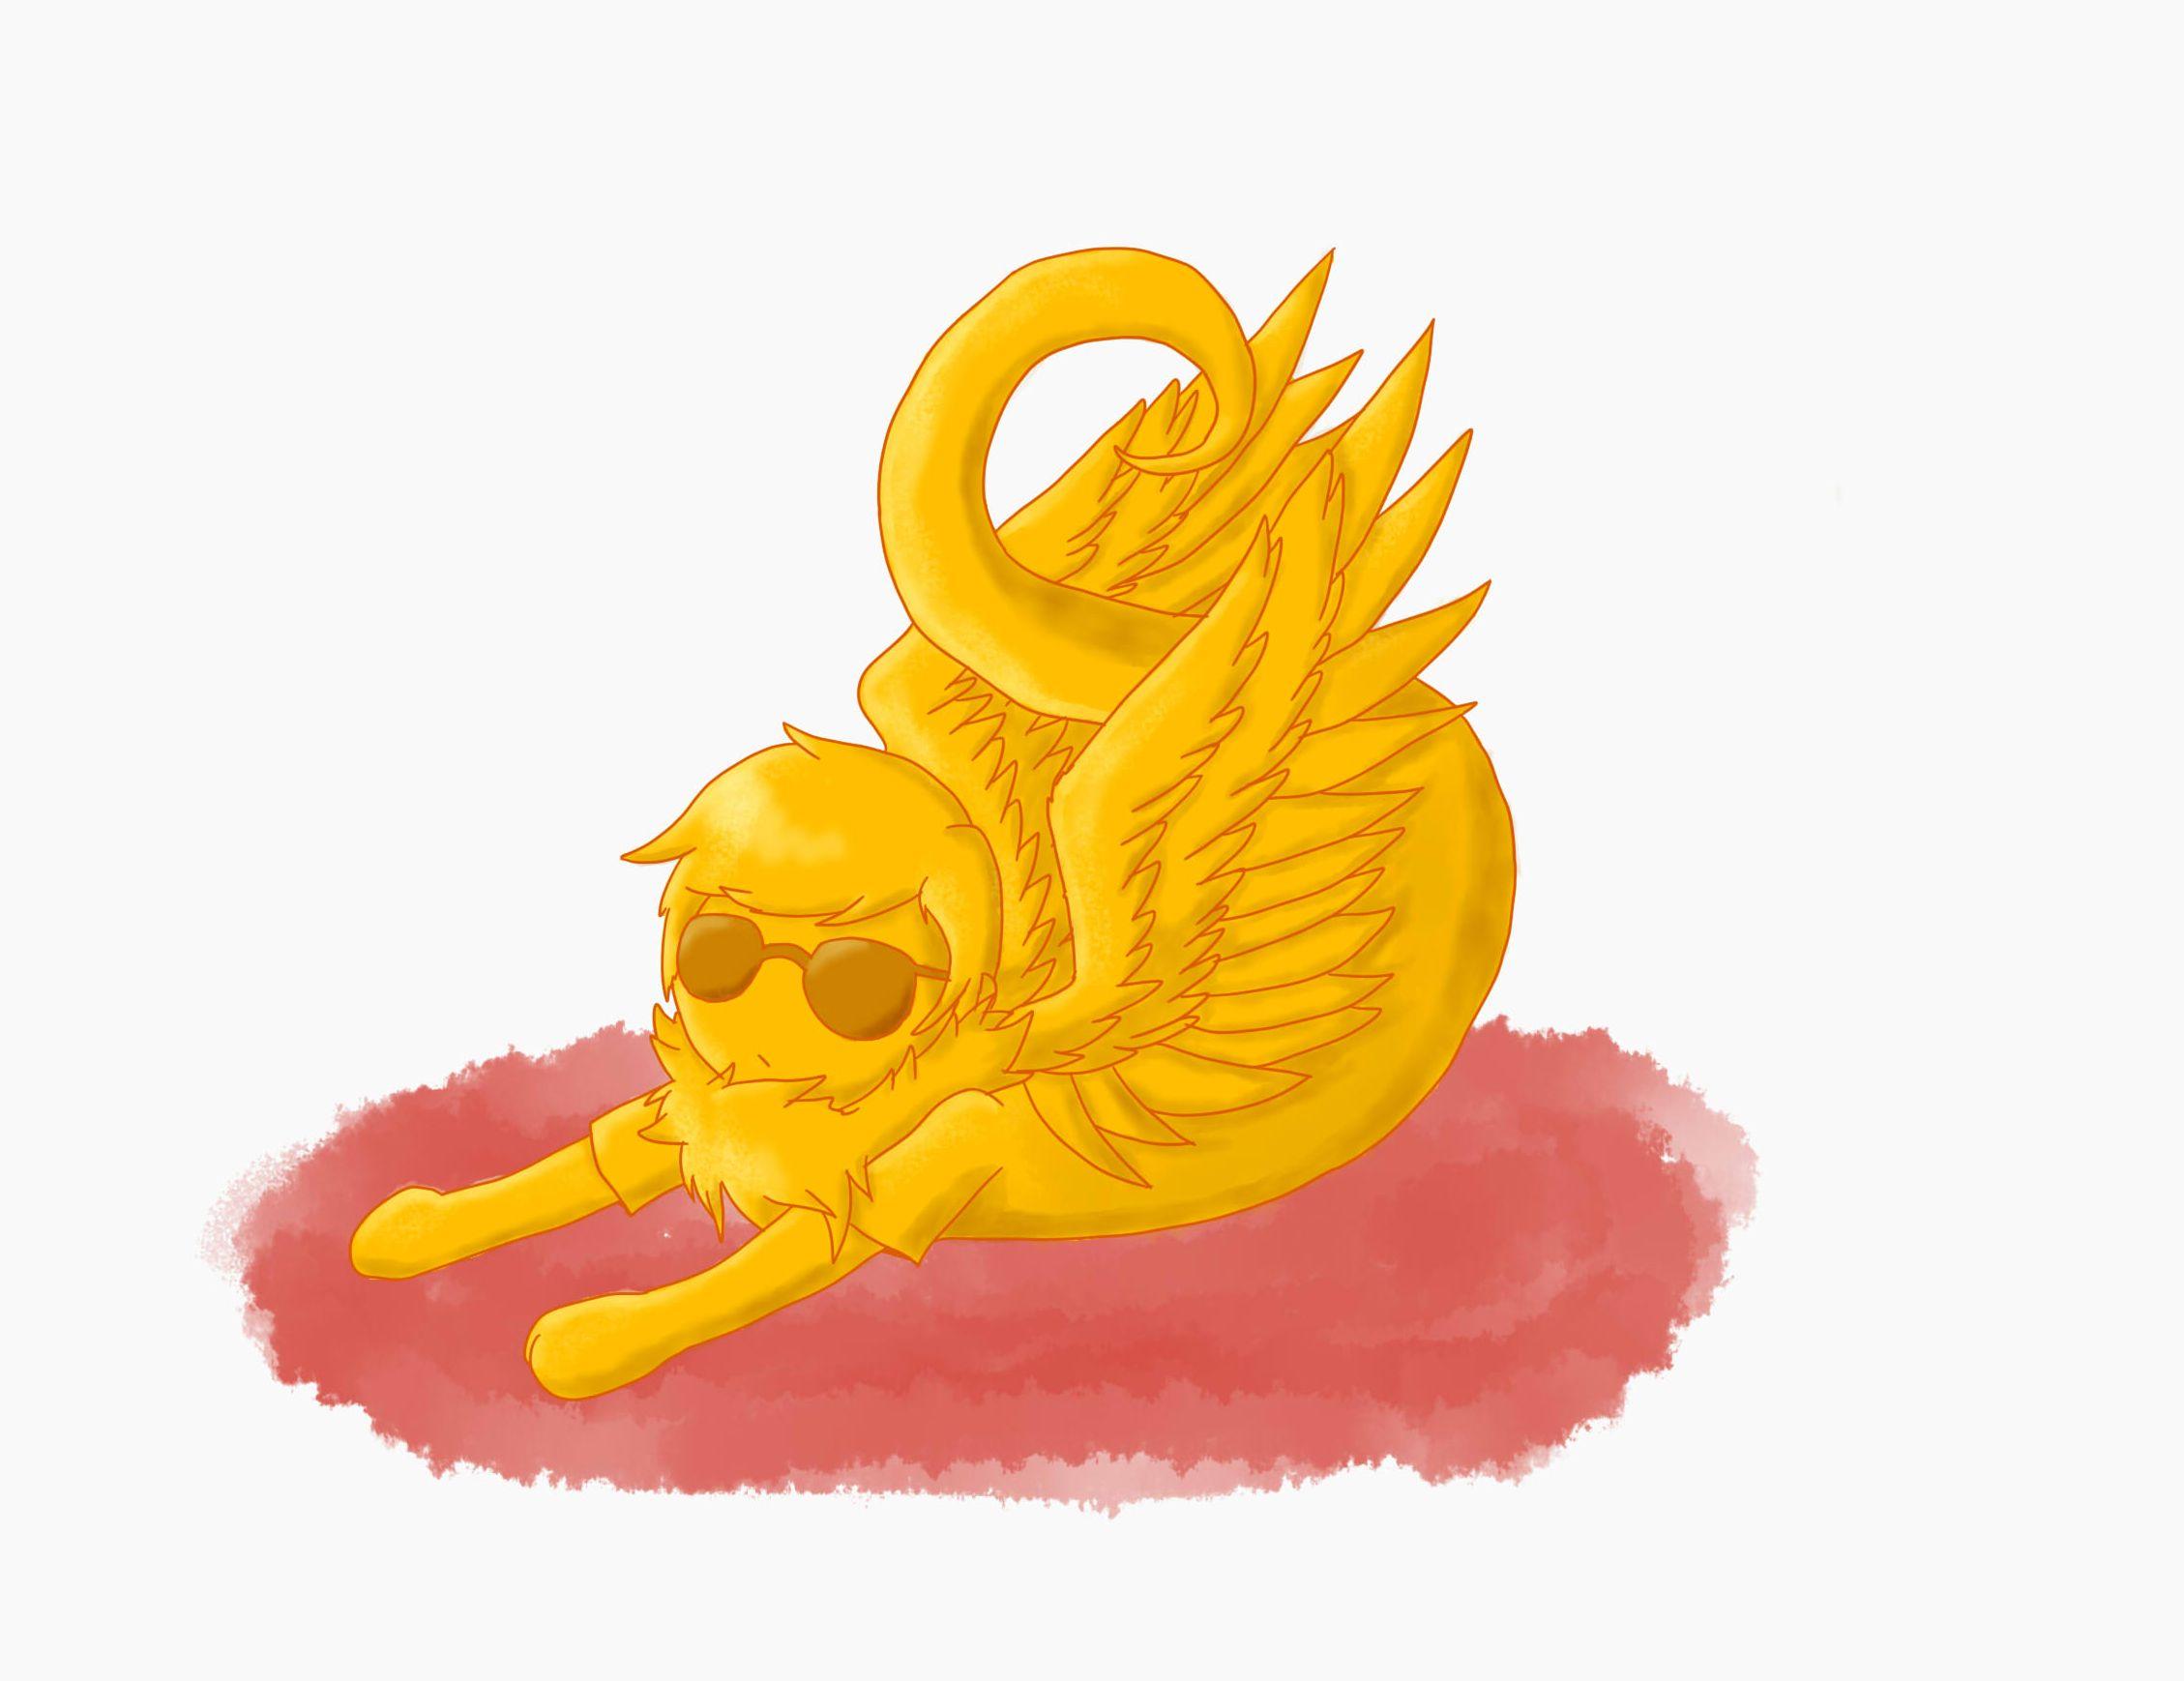 Davesprite doodle by Koji45